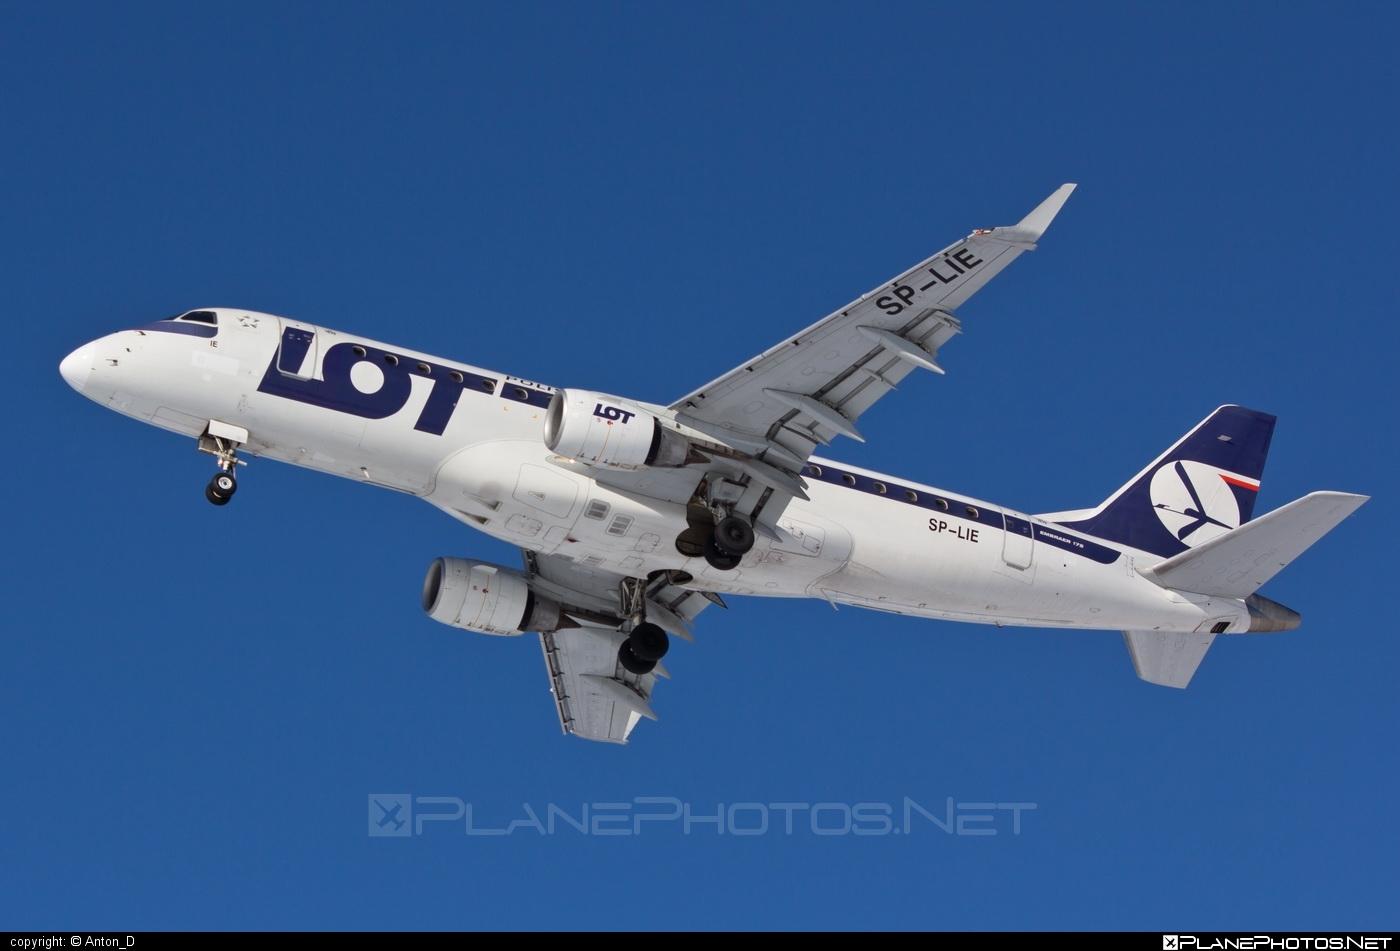 Embraer E175LR (ERJ-170-200LR) - SP-LIE operated by LOT Polish Airlines #e175 #embraer #embraer175 #embraer175lr #erj170200 #erj170200lr #erj175 #erj175lr #lot #lotpolishairlines